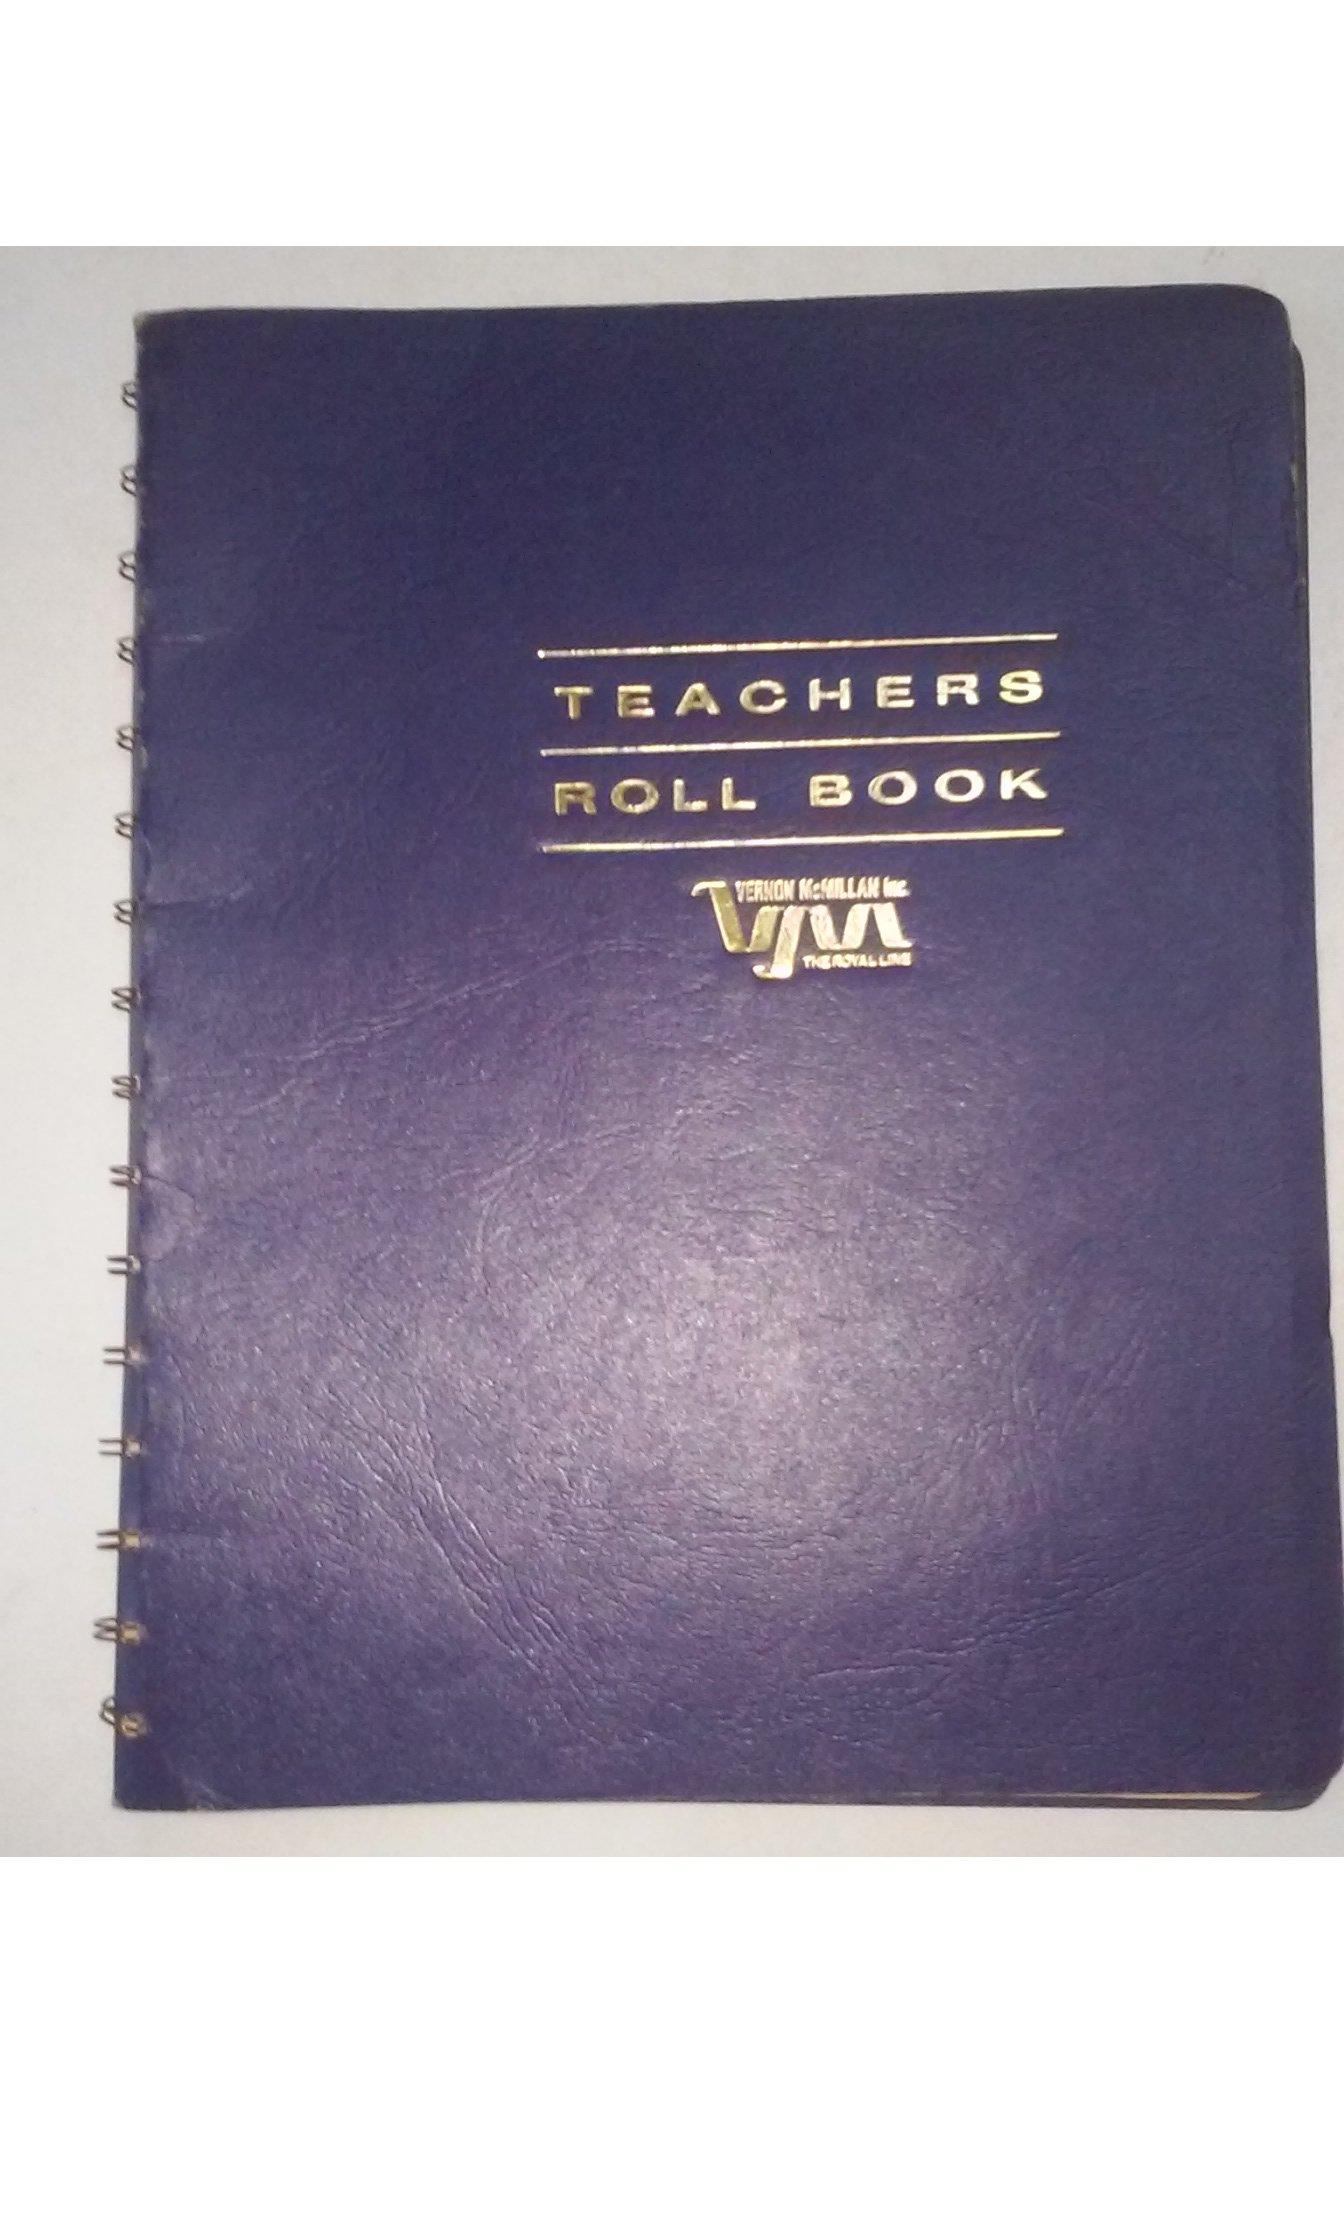 Vernon McMillan 50-1220 (120-02) Roll Book Made in USA